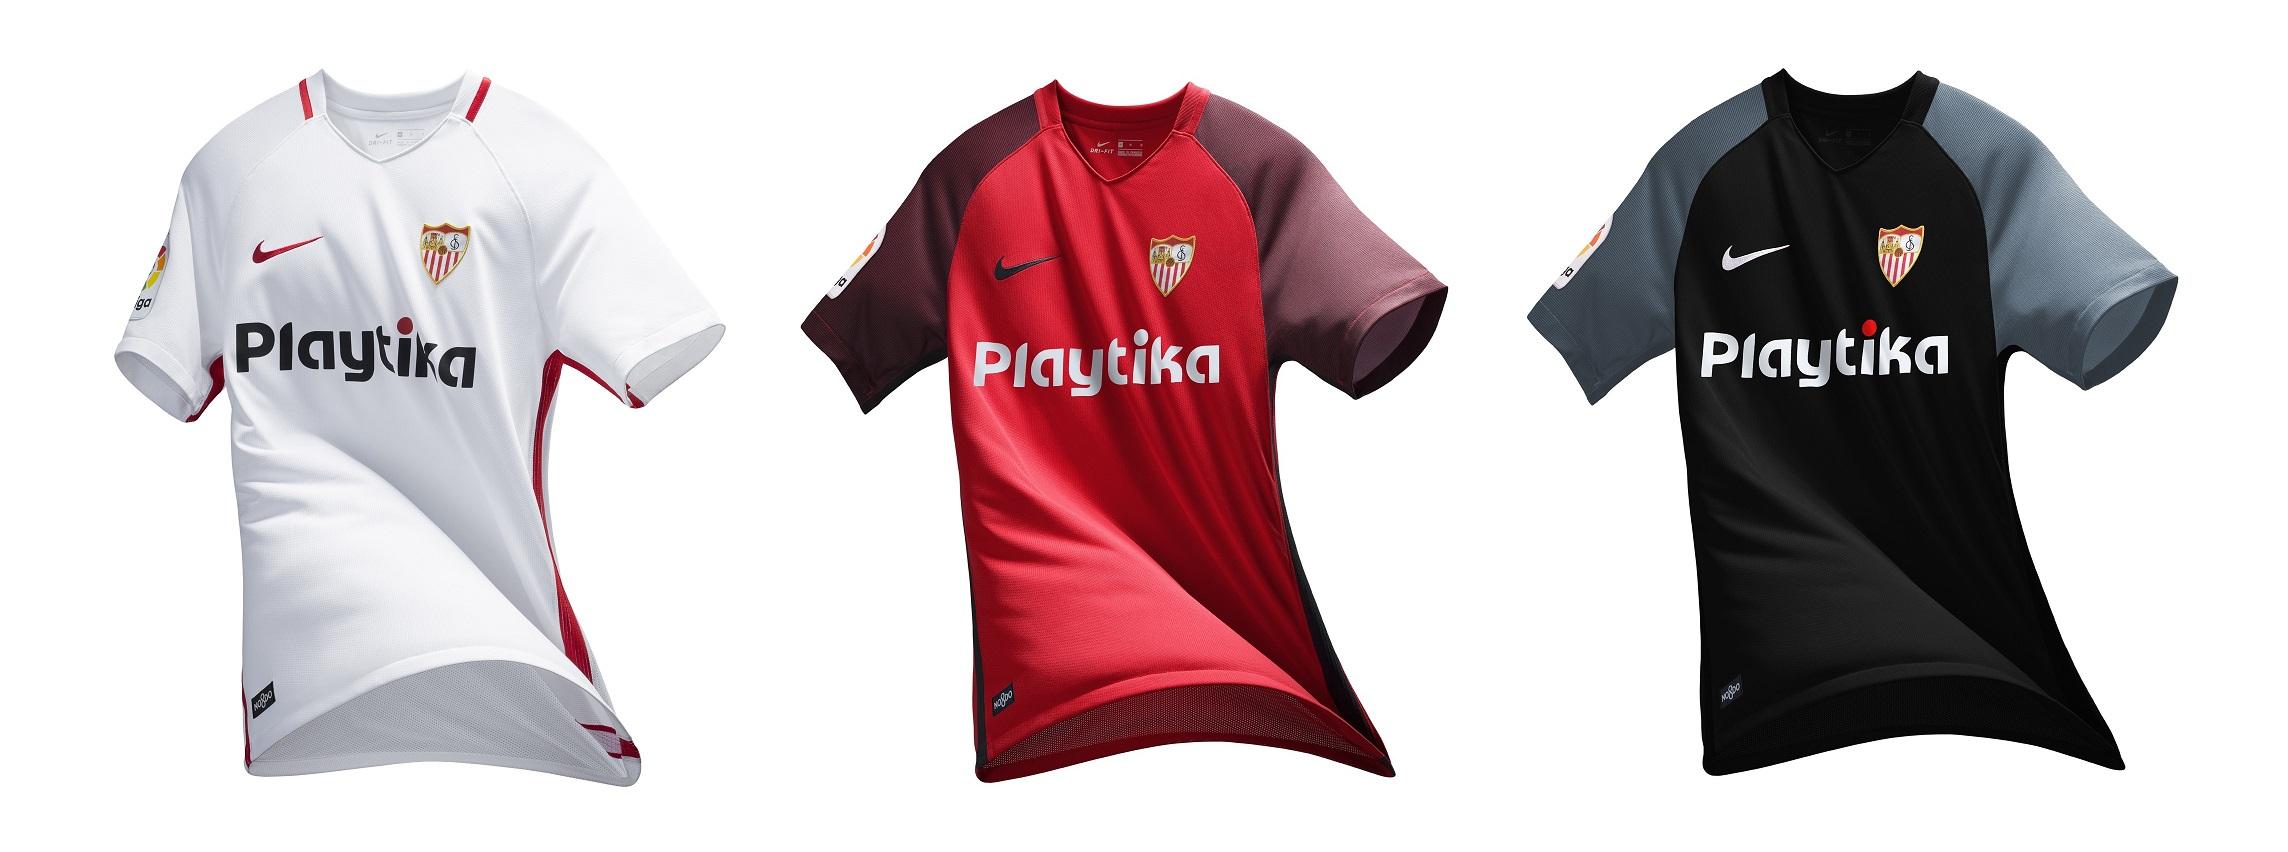 Las tres equipaciones del Sevilla (SFC). f1750989acd5a